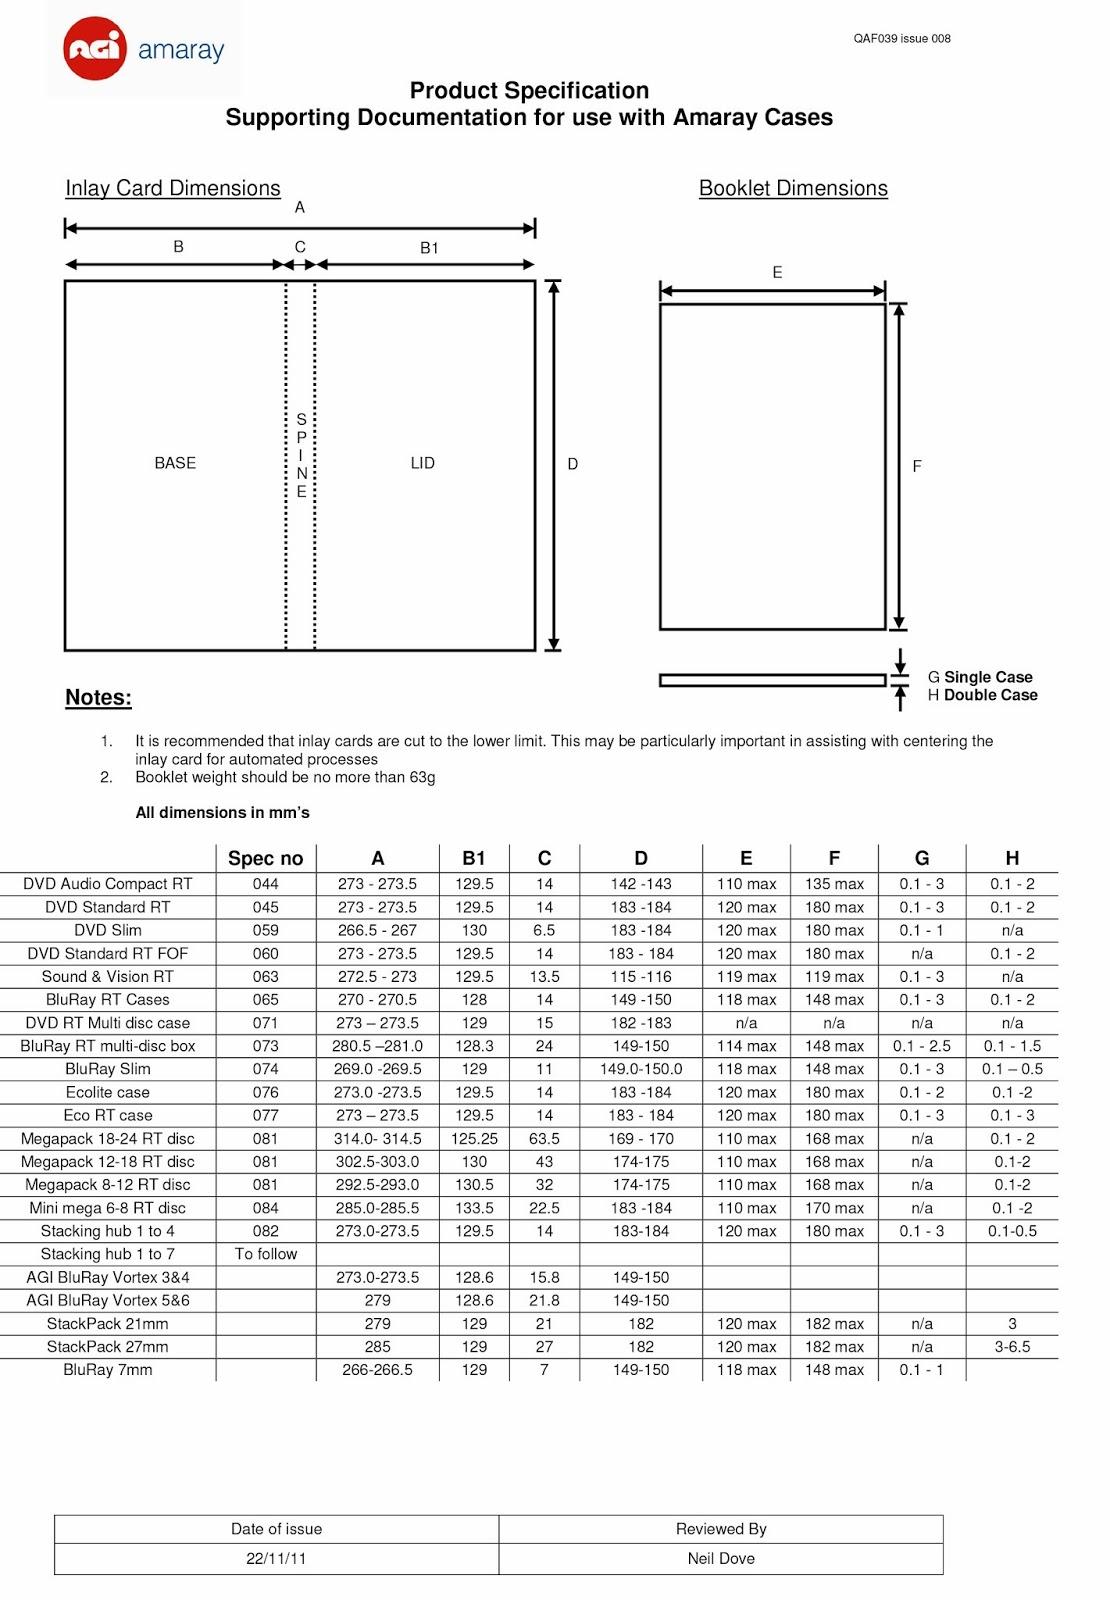 Digital Imaging Software 1 Amaray Dvd Case Dimensions